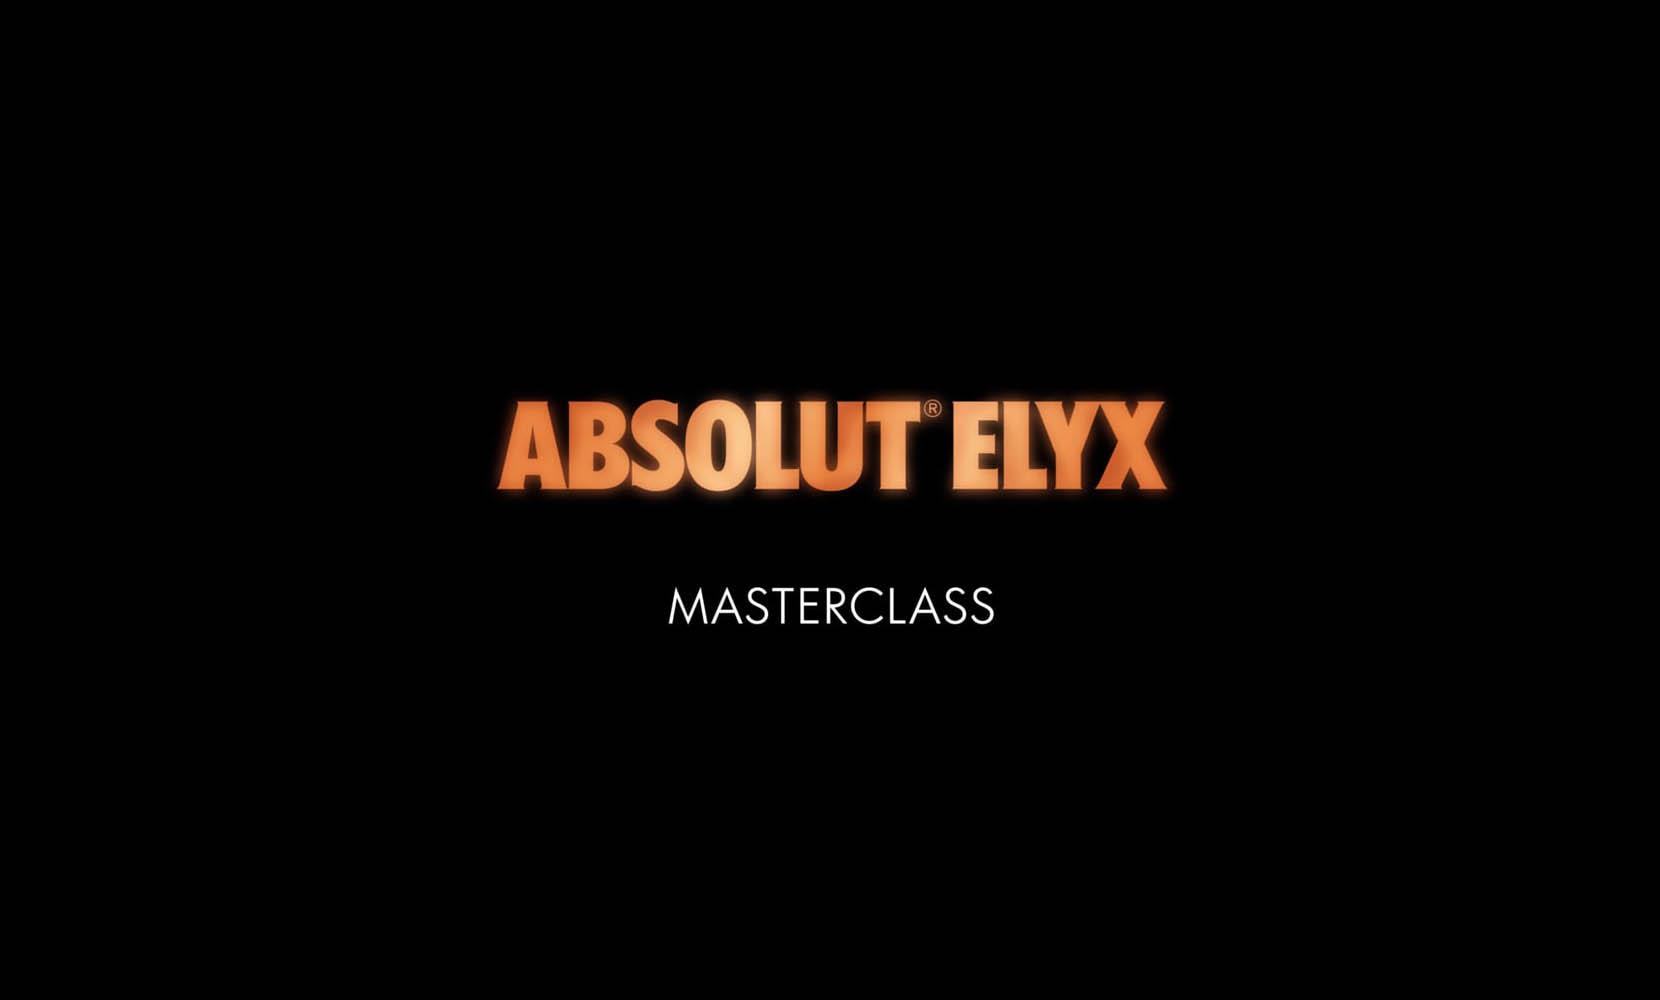 Absolut Elyx Master Class